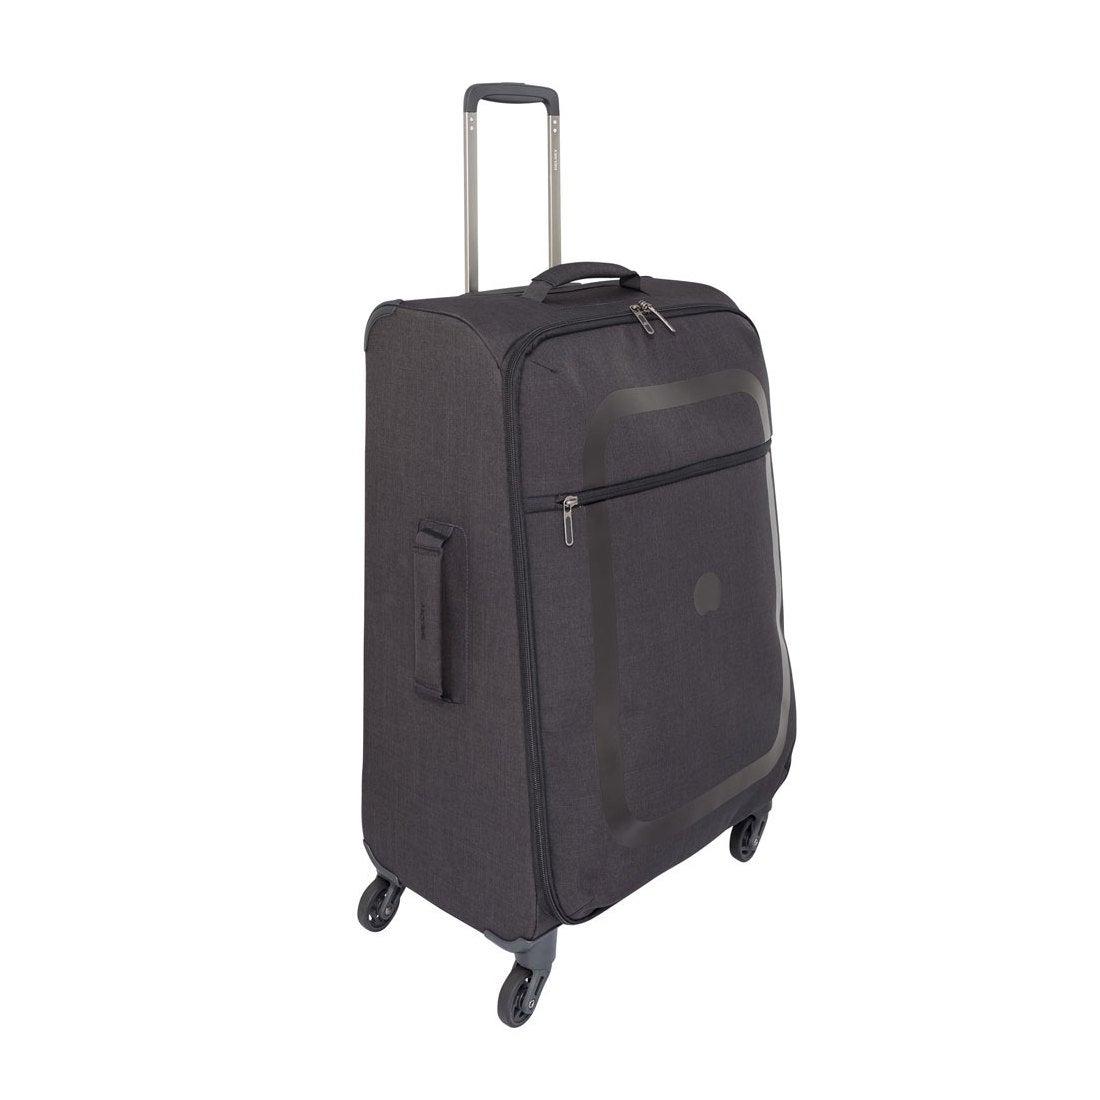 【SAC'S BAR】デルセー DELSEY スーツケース DAUPHINE DDAS-57 57cm ブラック レディース